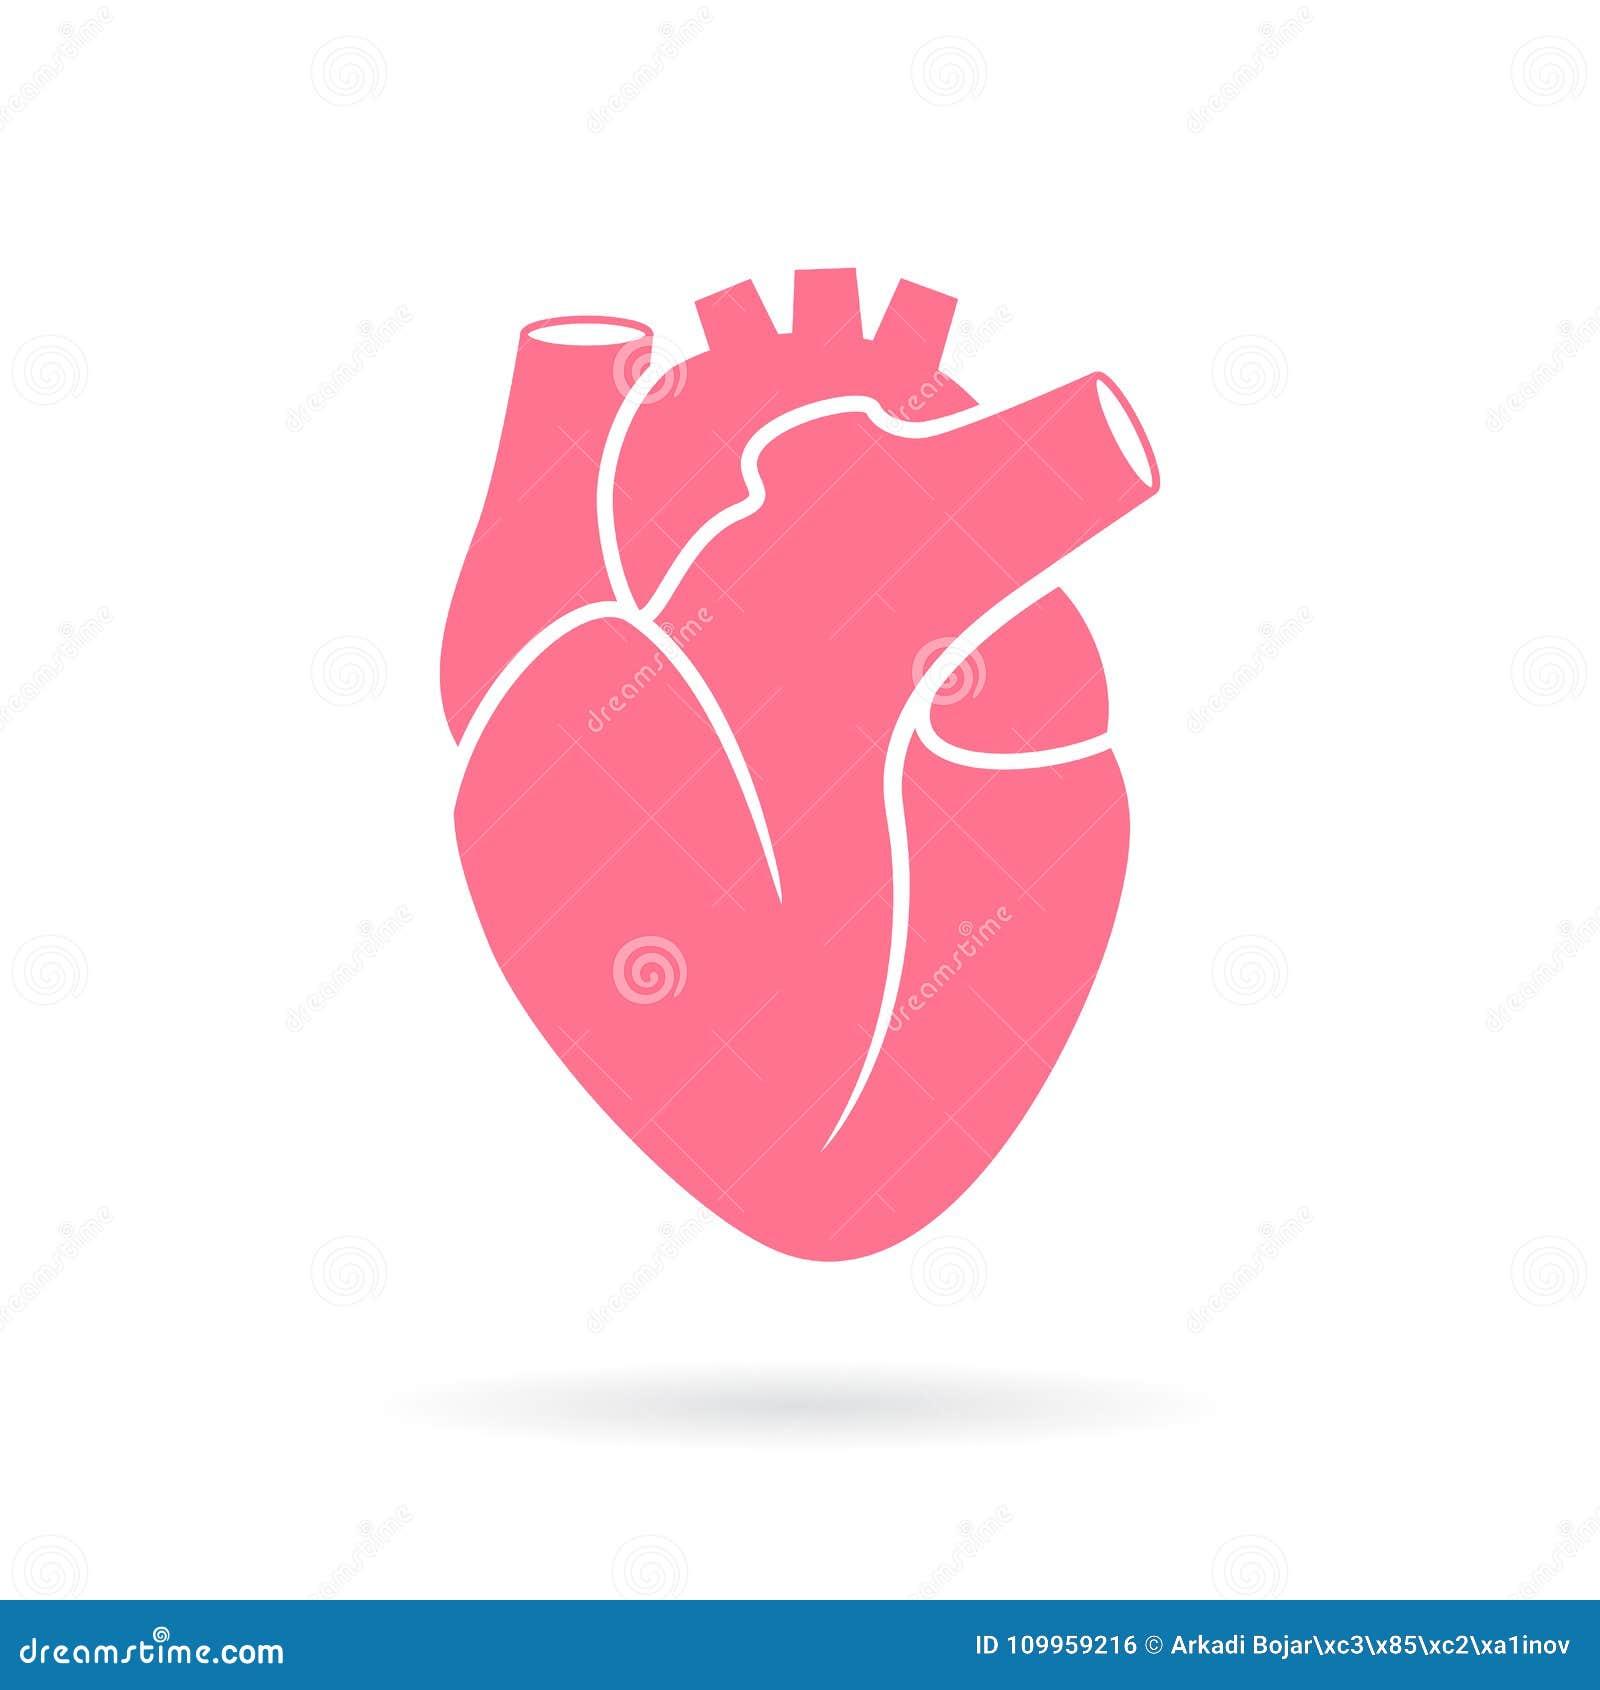 Heart anatomy vector icon stock vector. Illustration of hearts ...